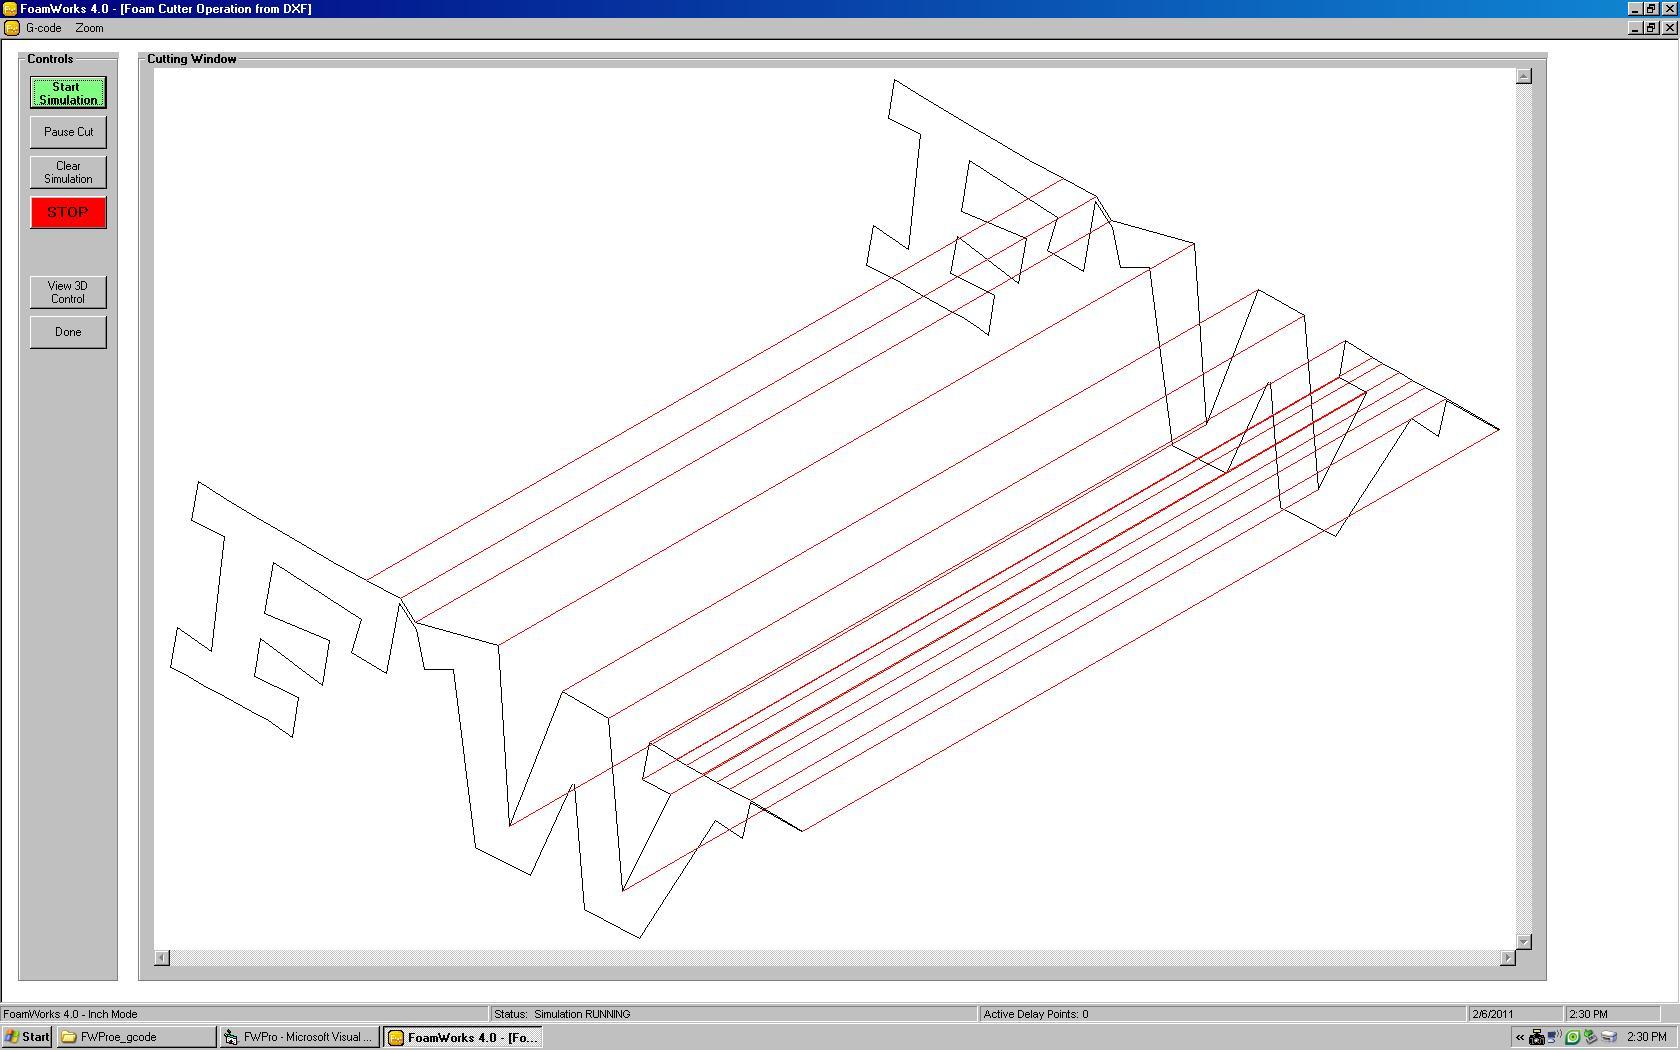 FoamWorks 4.0 cut simulation